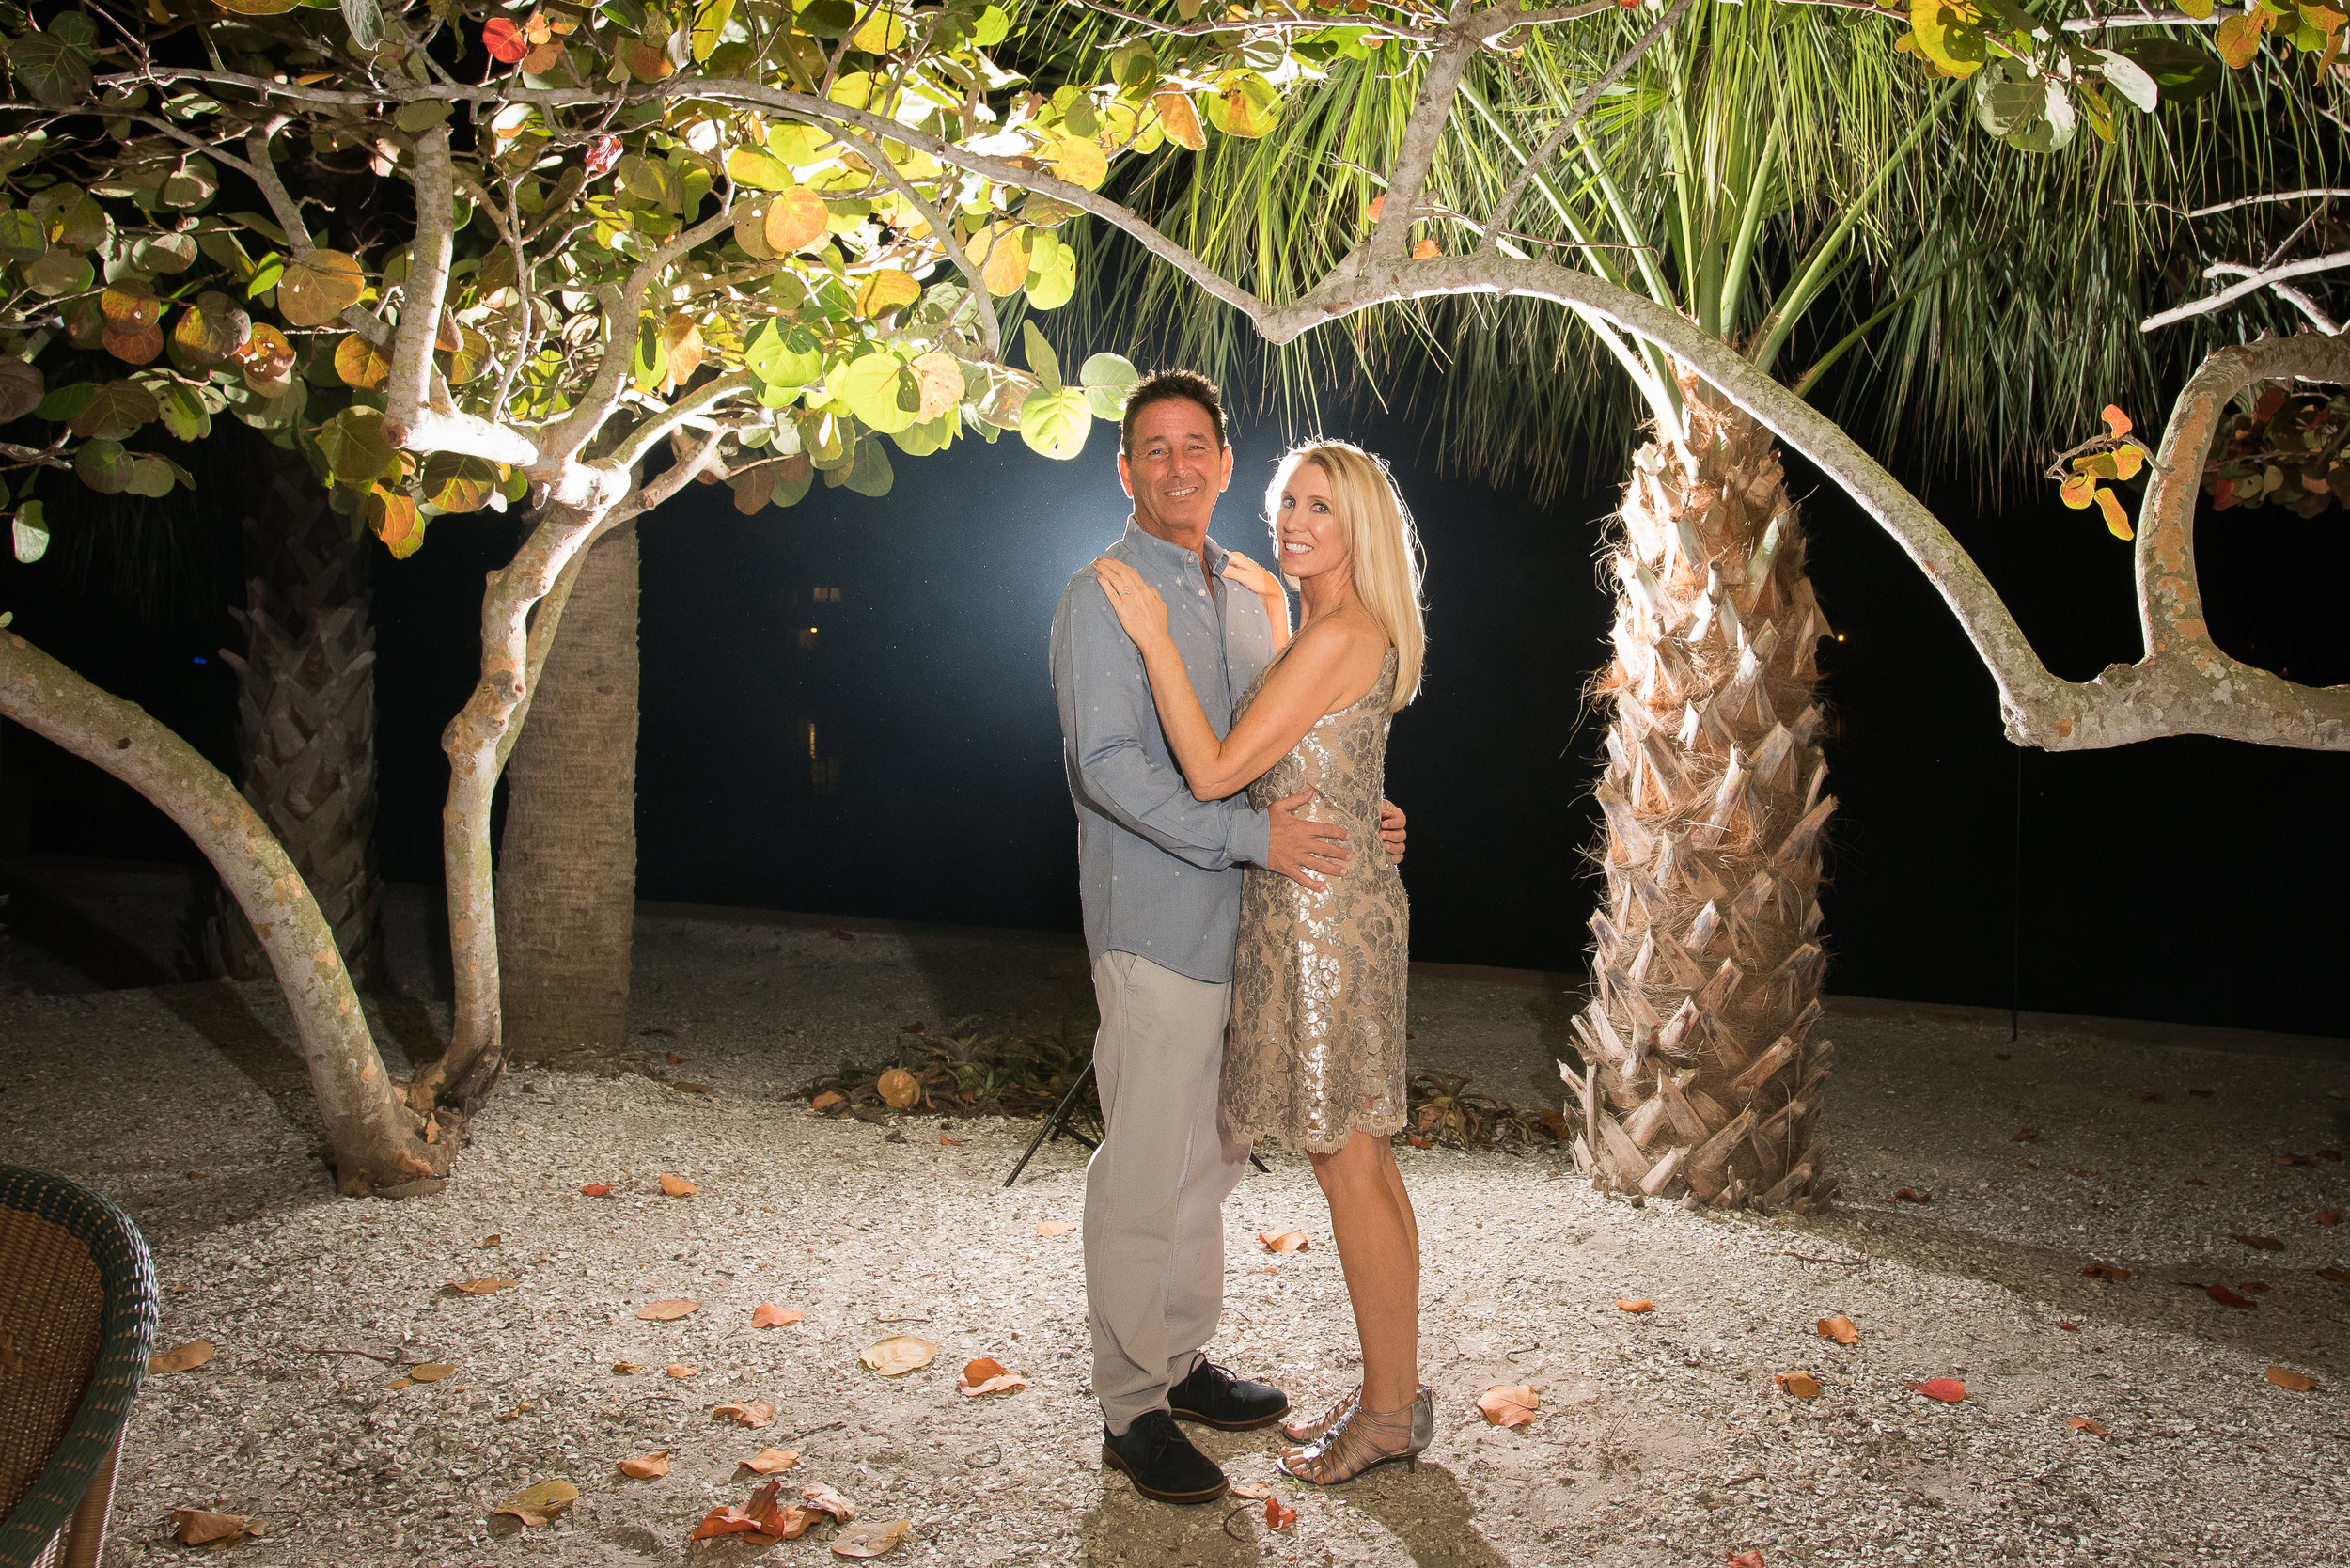 Indian Rocks engagement party, St. Pete engagement party, St. Pete engagement, St. Pete wedding photographer, Tampa wedding photographer, Mir Salgado photography